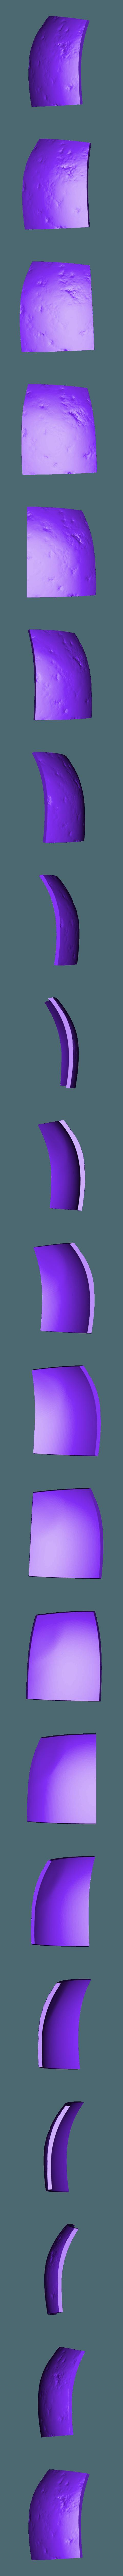 Armory_Damaged_Print16.stl Download OBJ file Armory - Knights of Ren Helmet (damaged), 3D print model • 3D print design, 3D-mon